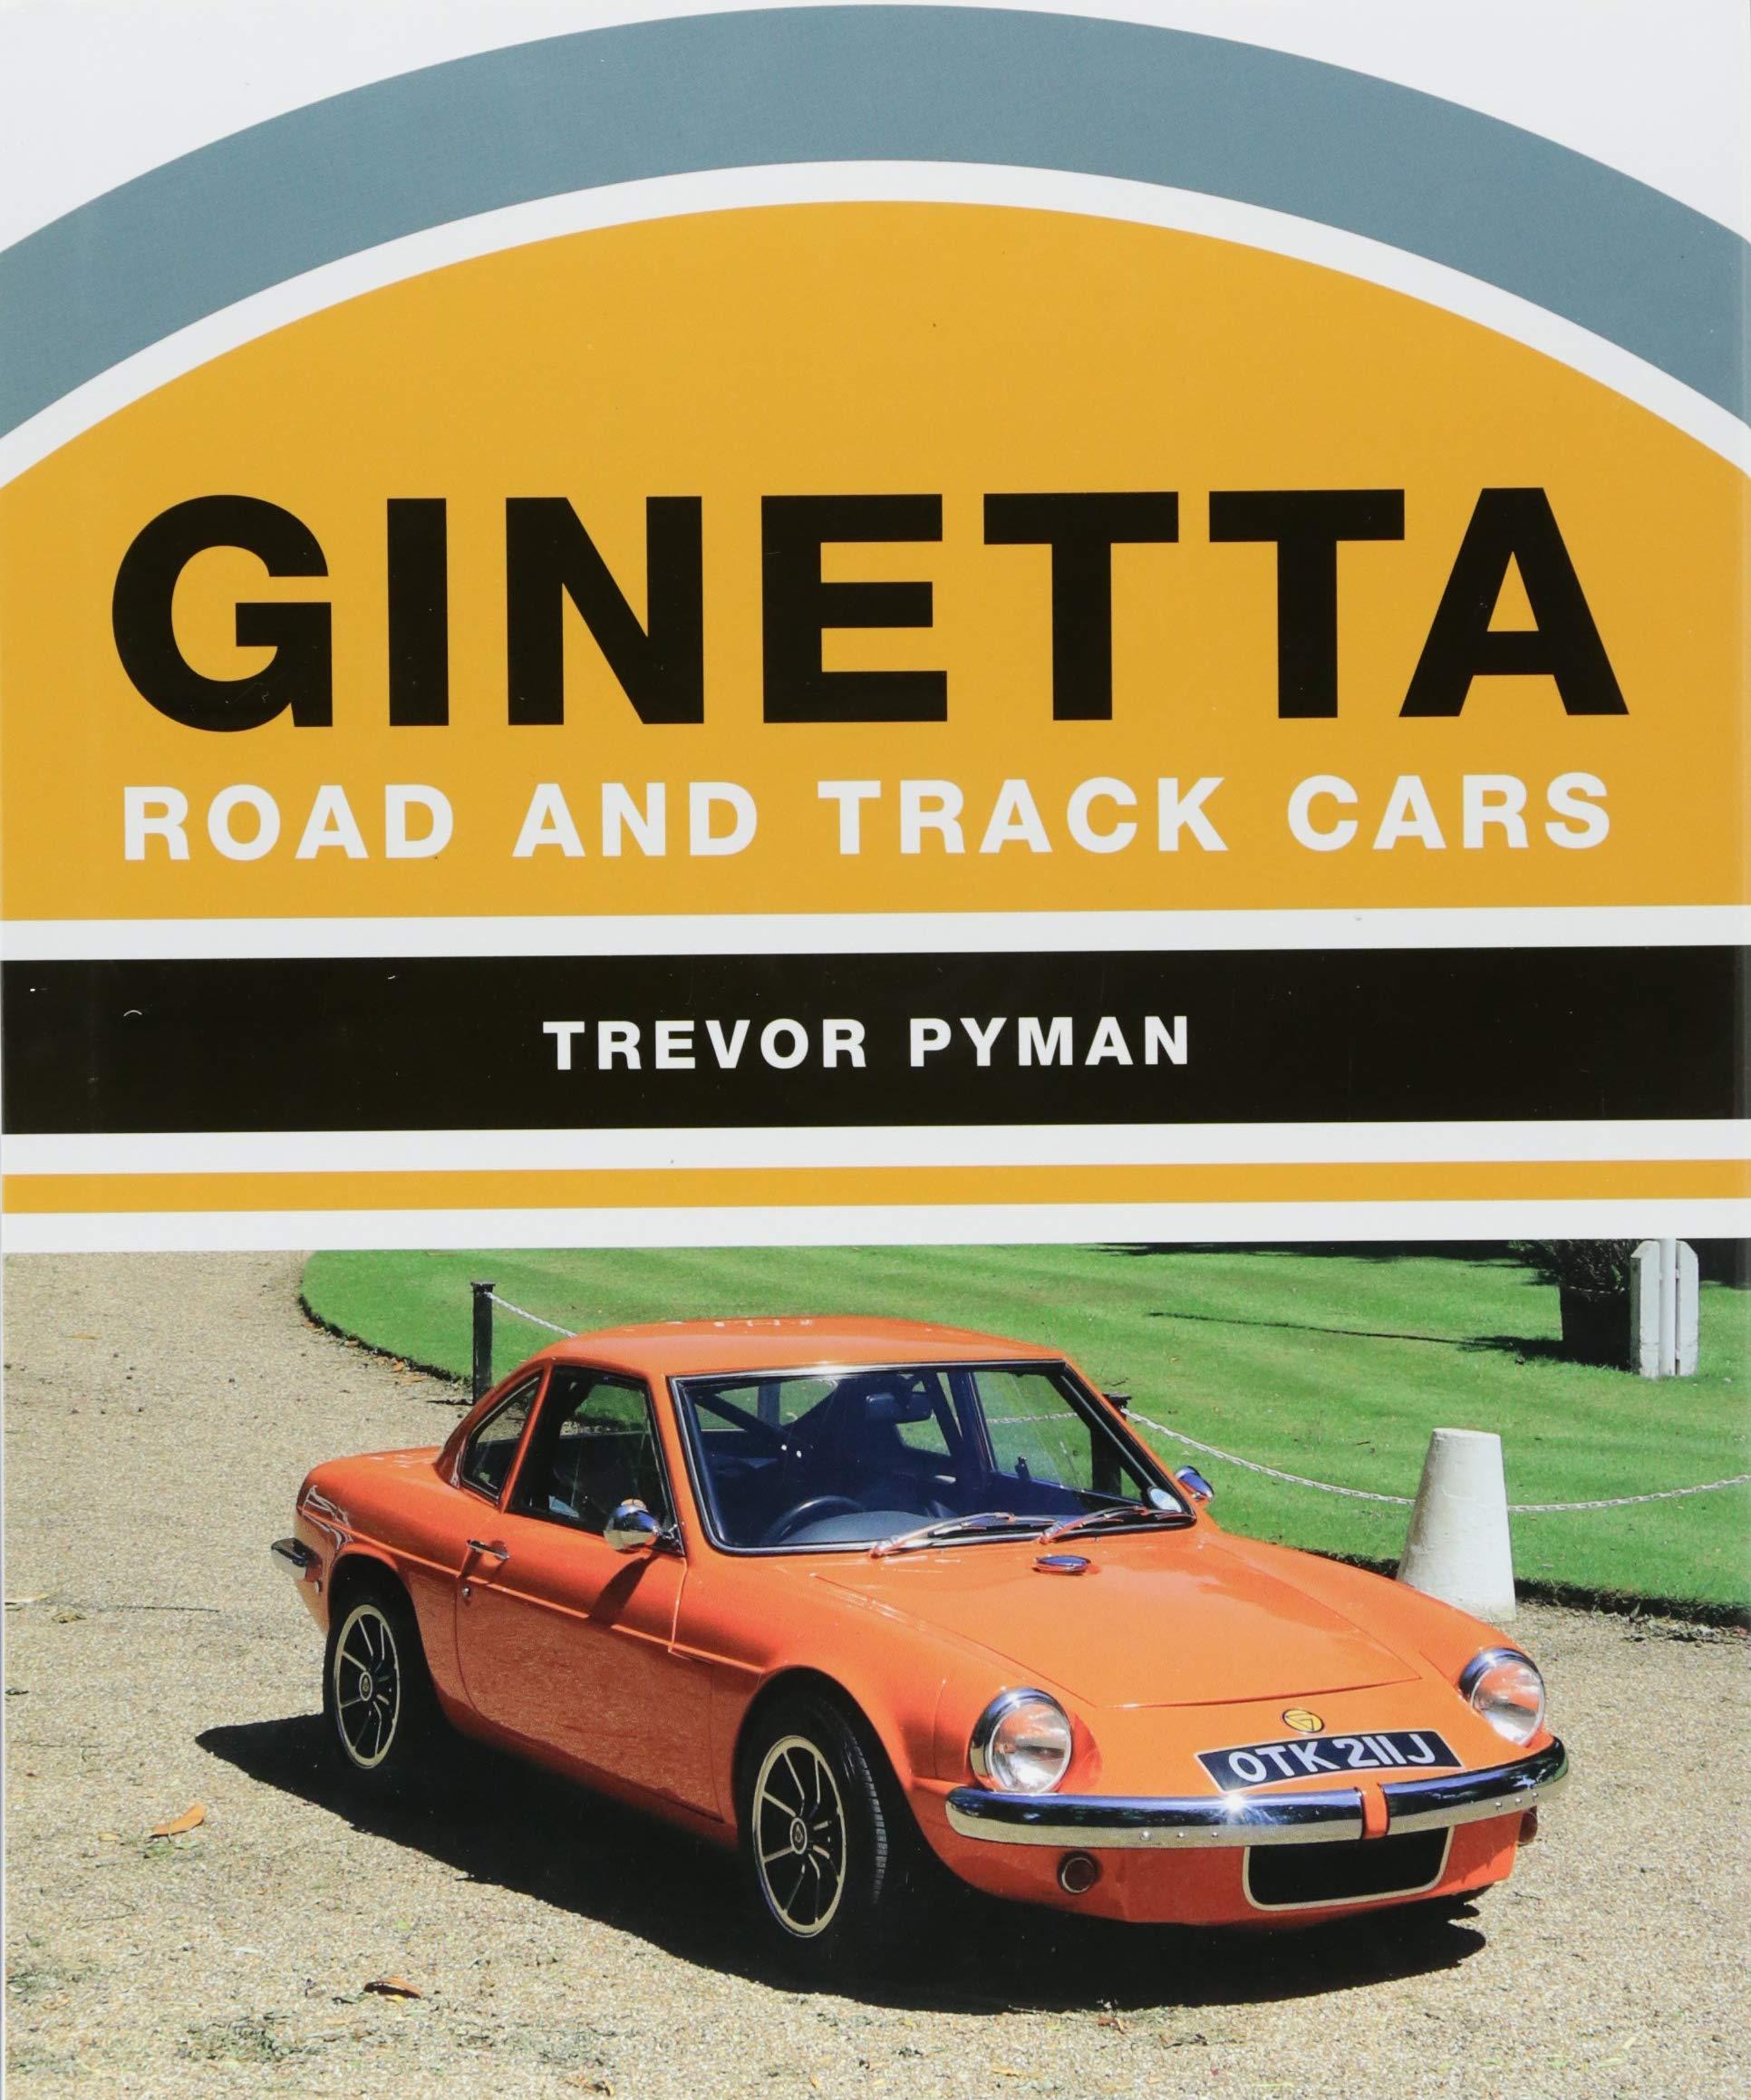 Pay Roadandtrack Com >> Ginetta Road And Track Cars Trevor Pyman 9781785004155 Amazon